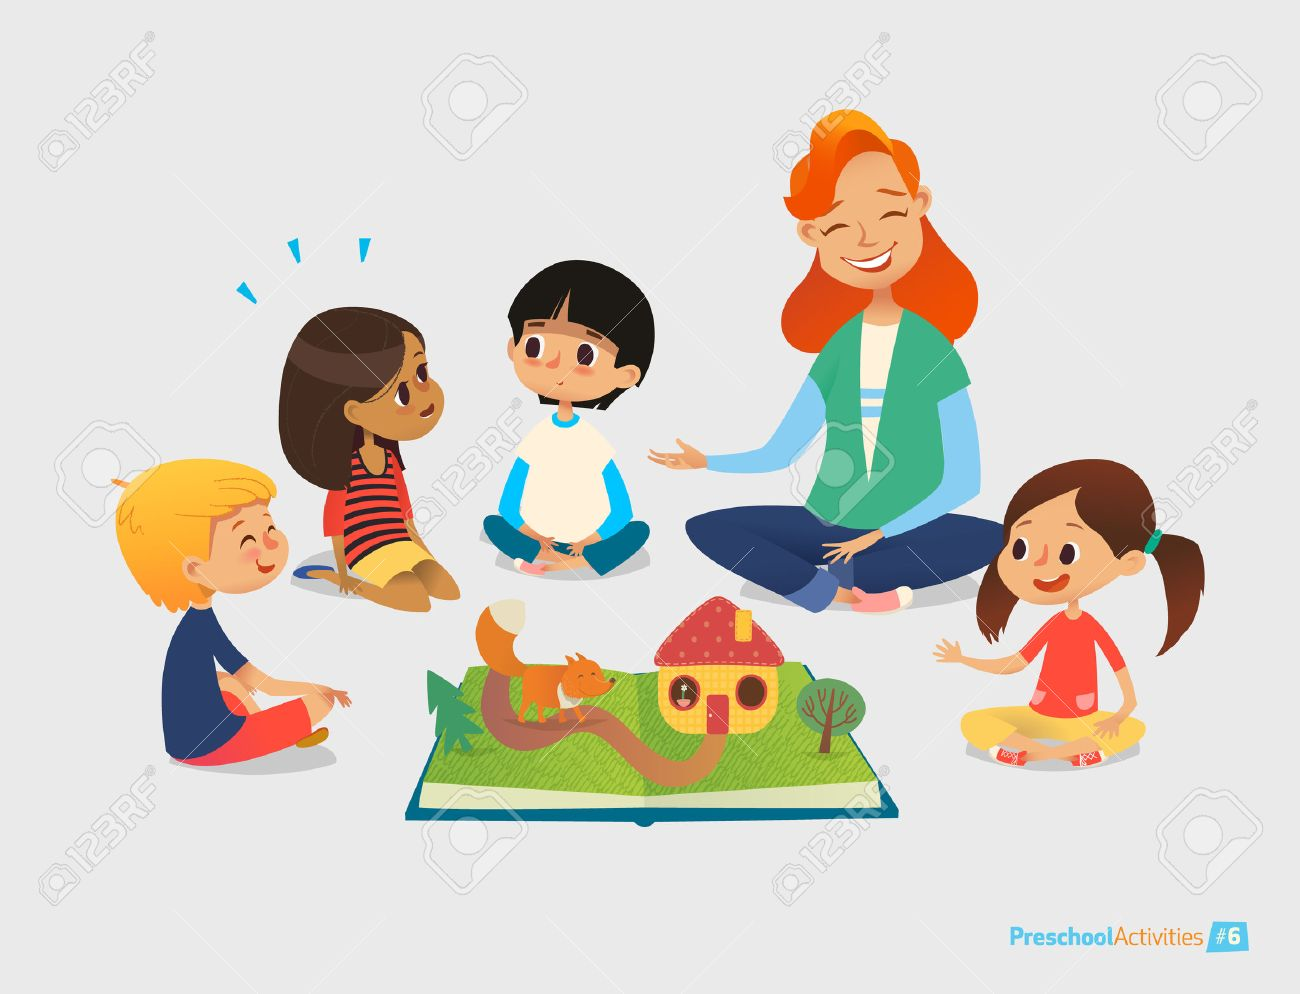 Female teacher tells fairy tales using pop-up book, children